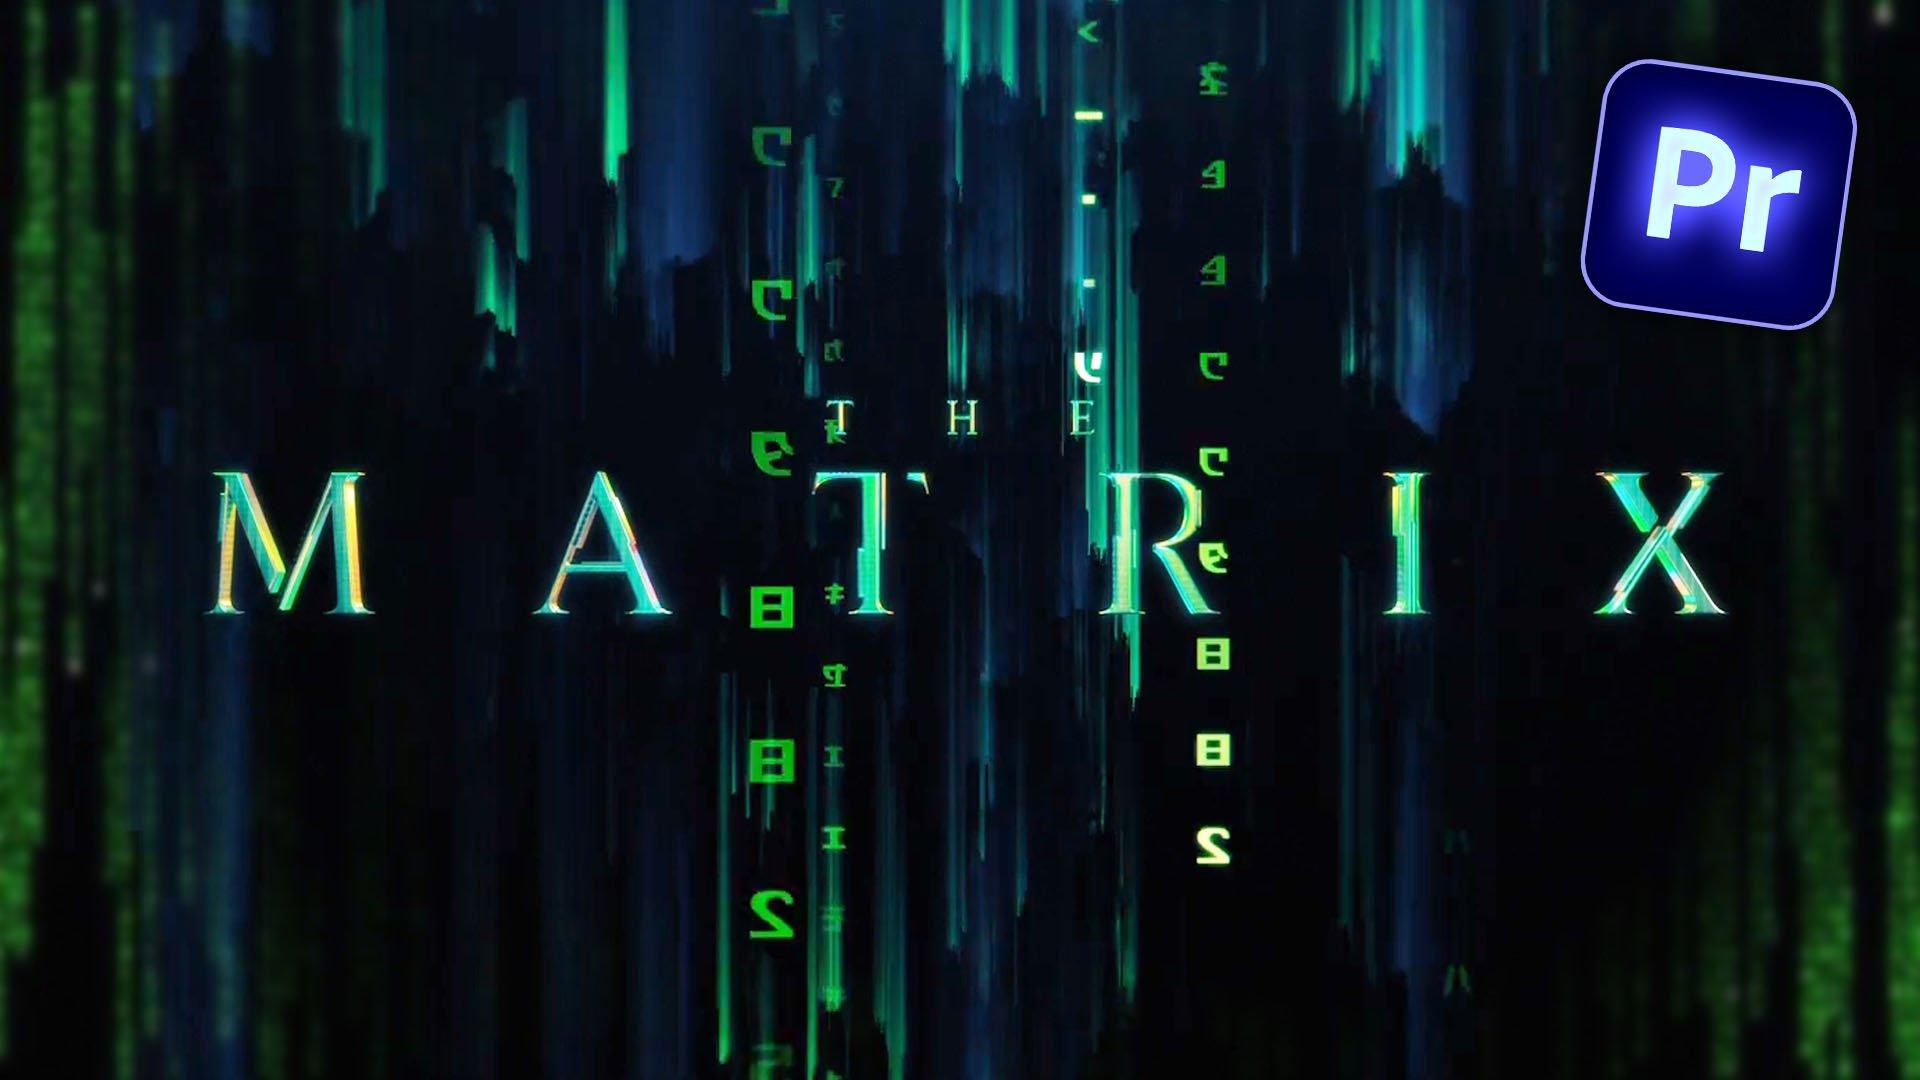 matrix-title-animation